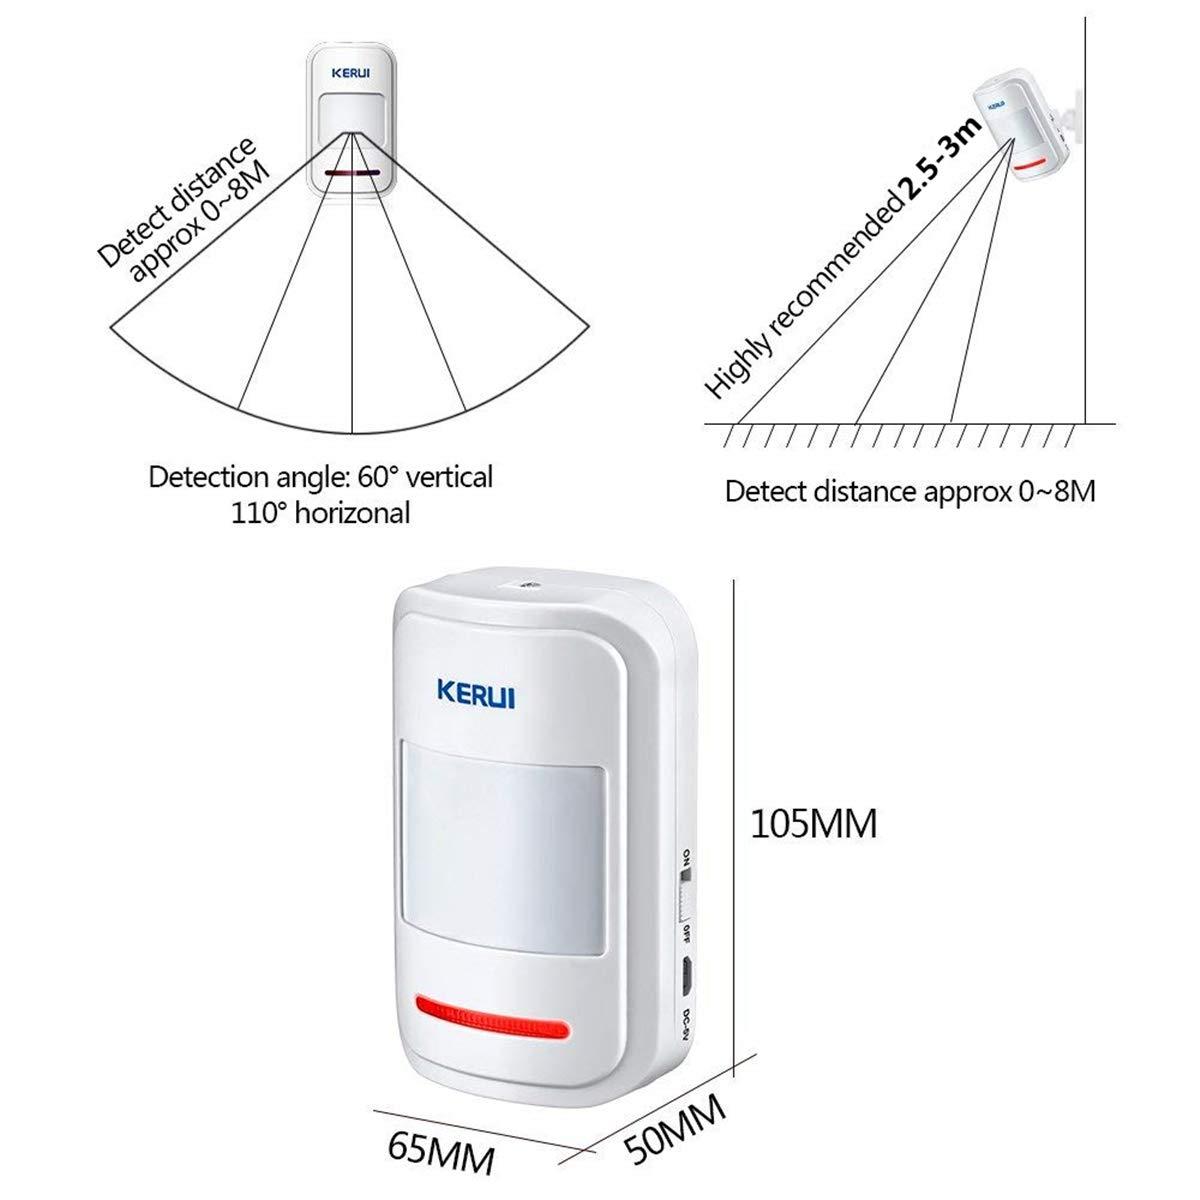 Kerui Wireless Pir Motion Sensor For Gsm Alarm Systems Diagram The Additional Electronics An External